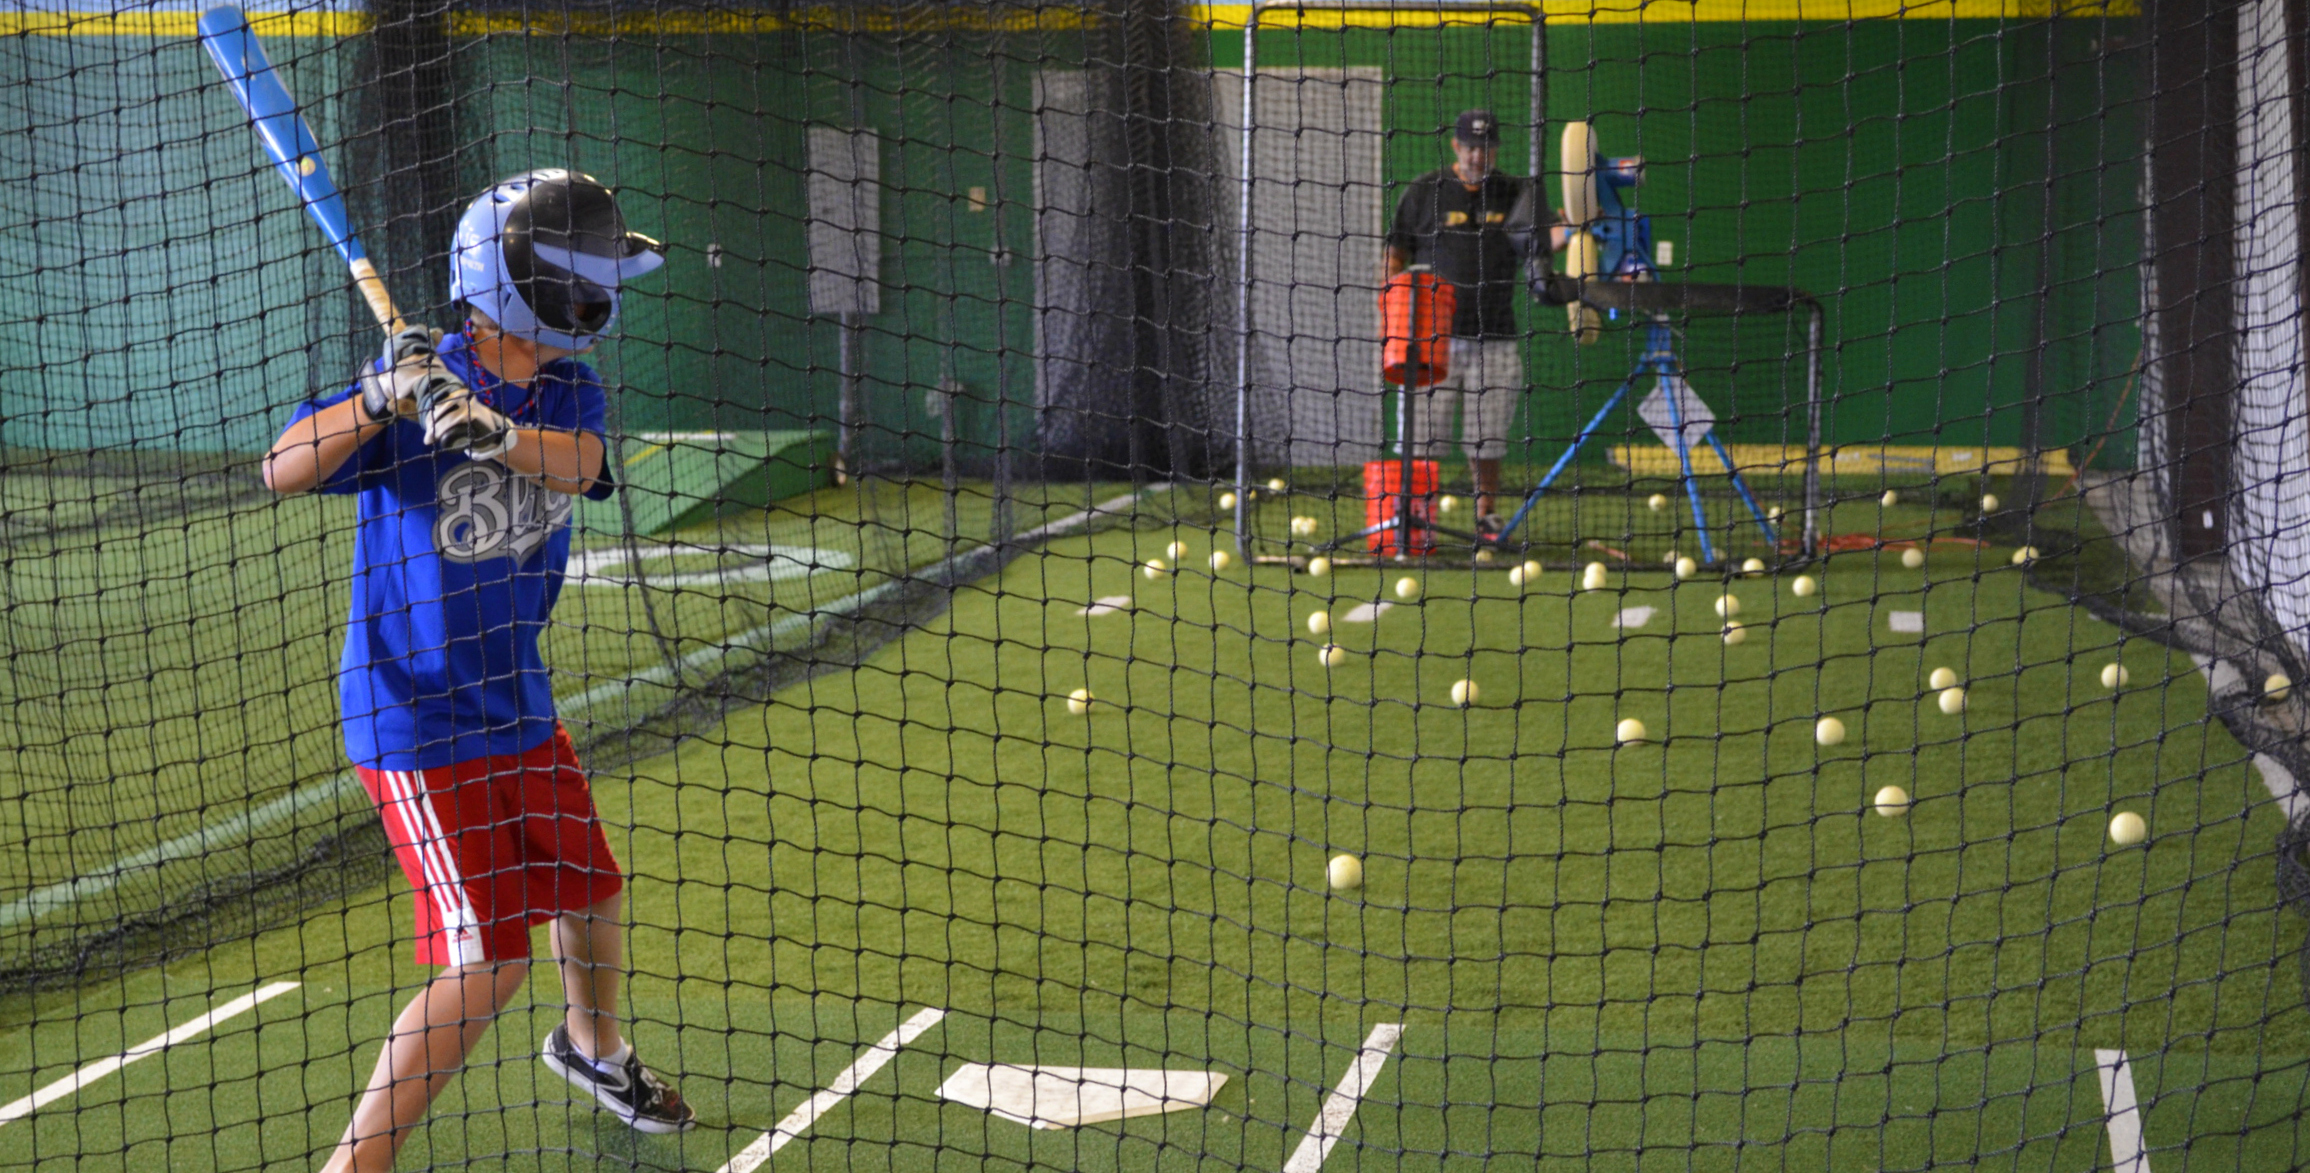 batting-cage-rentals.jpg